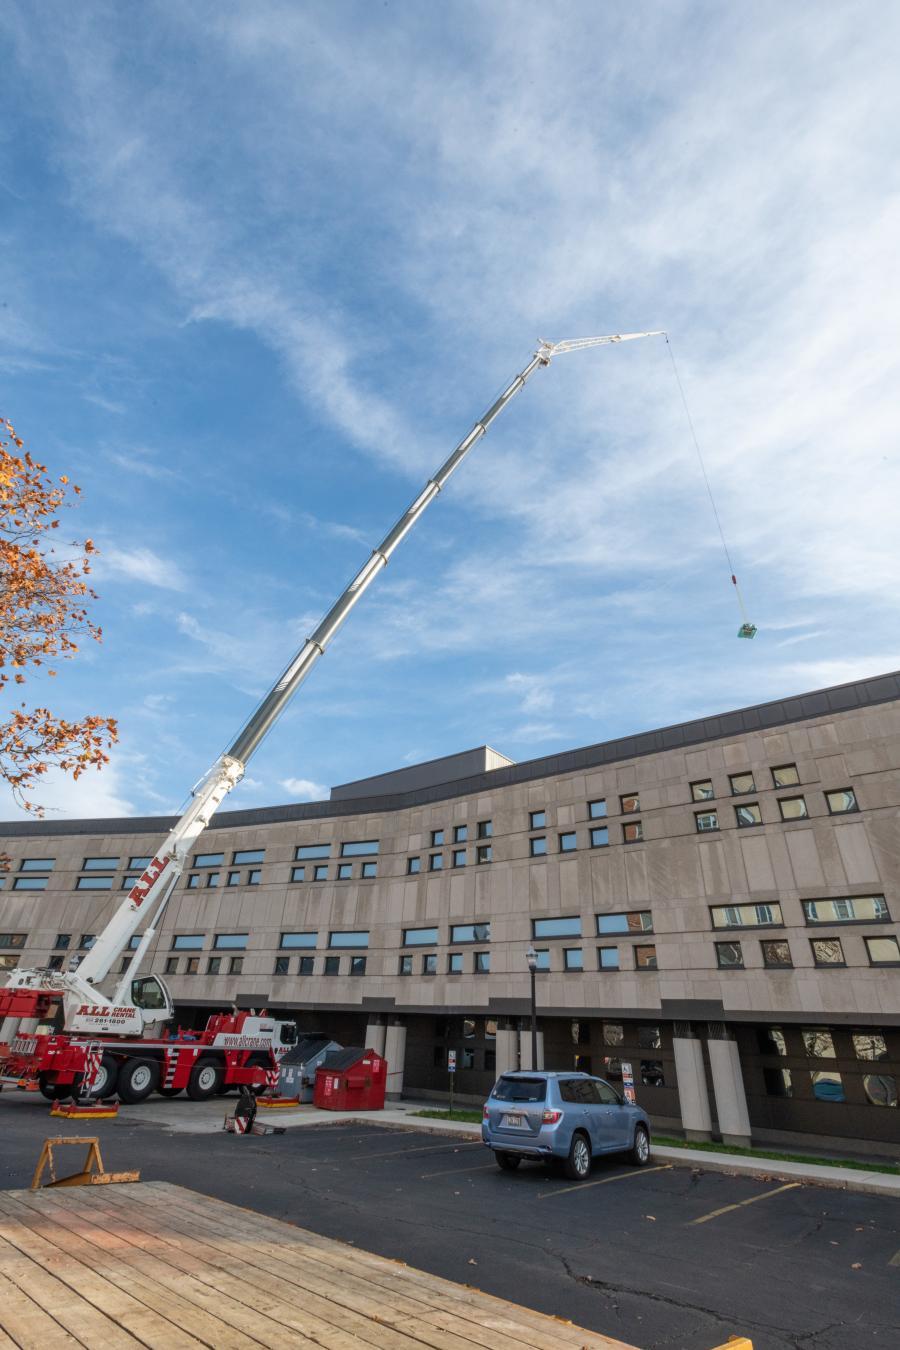 Grove and Liebherr cranes were hard at work on the OSU campus.